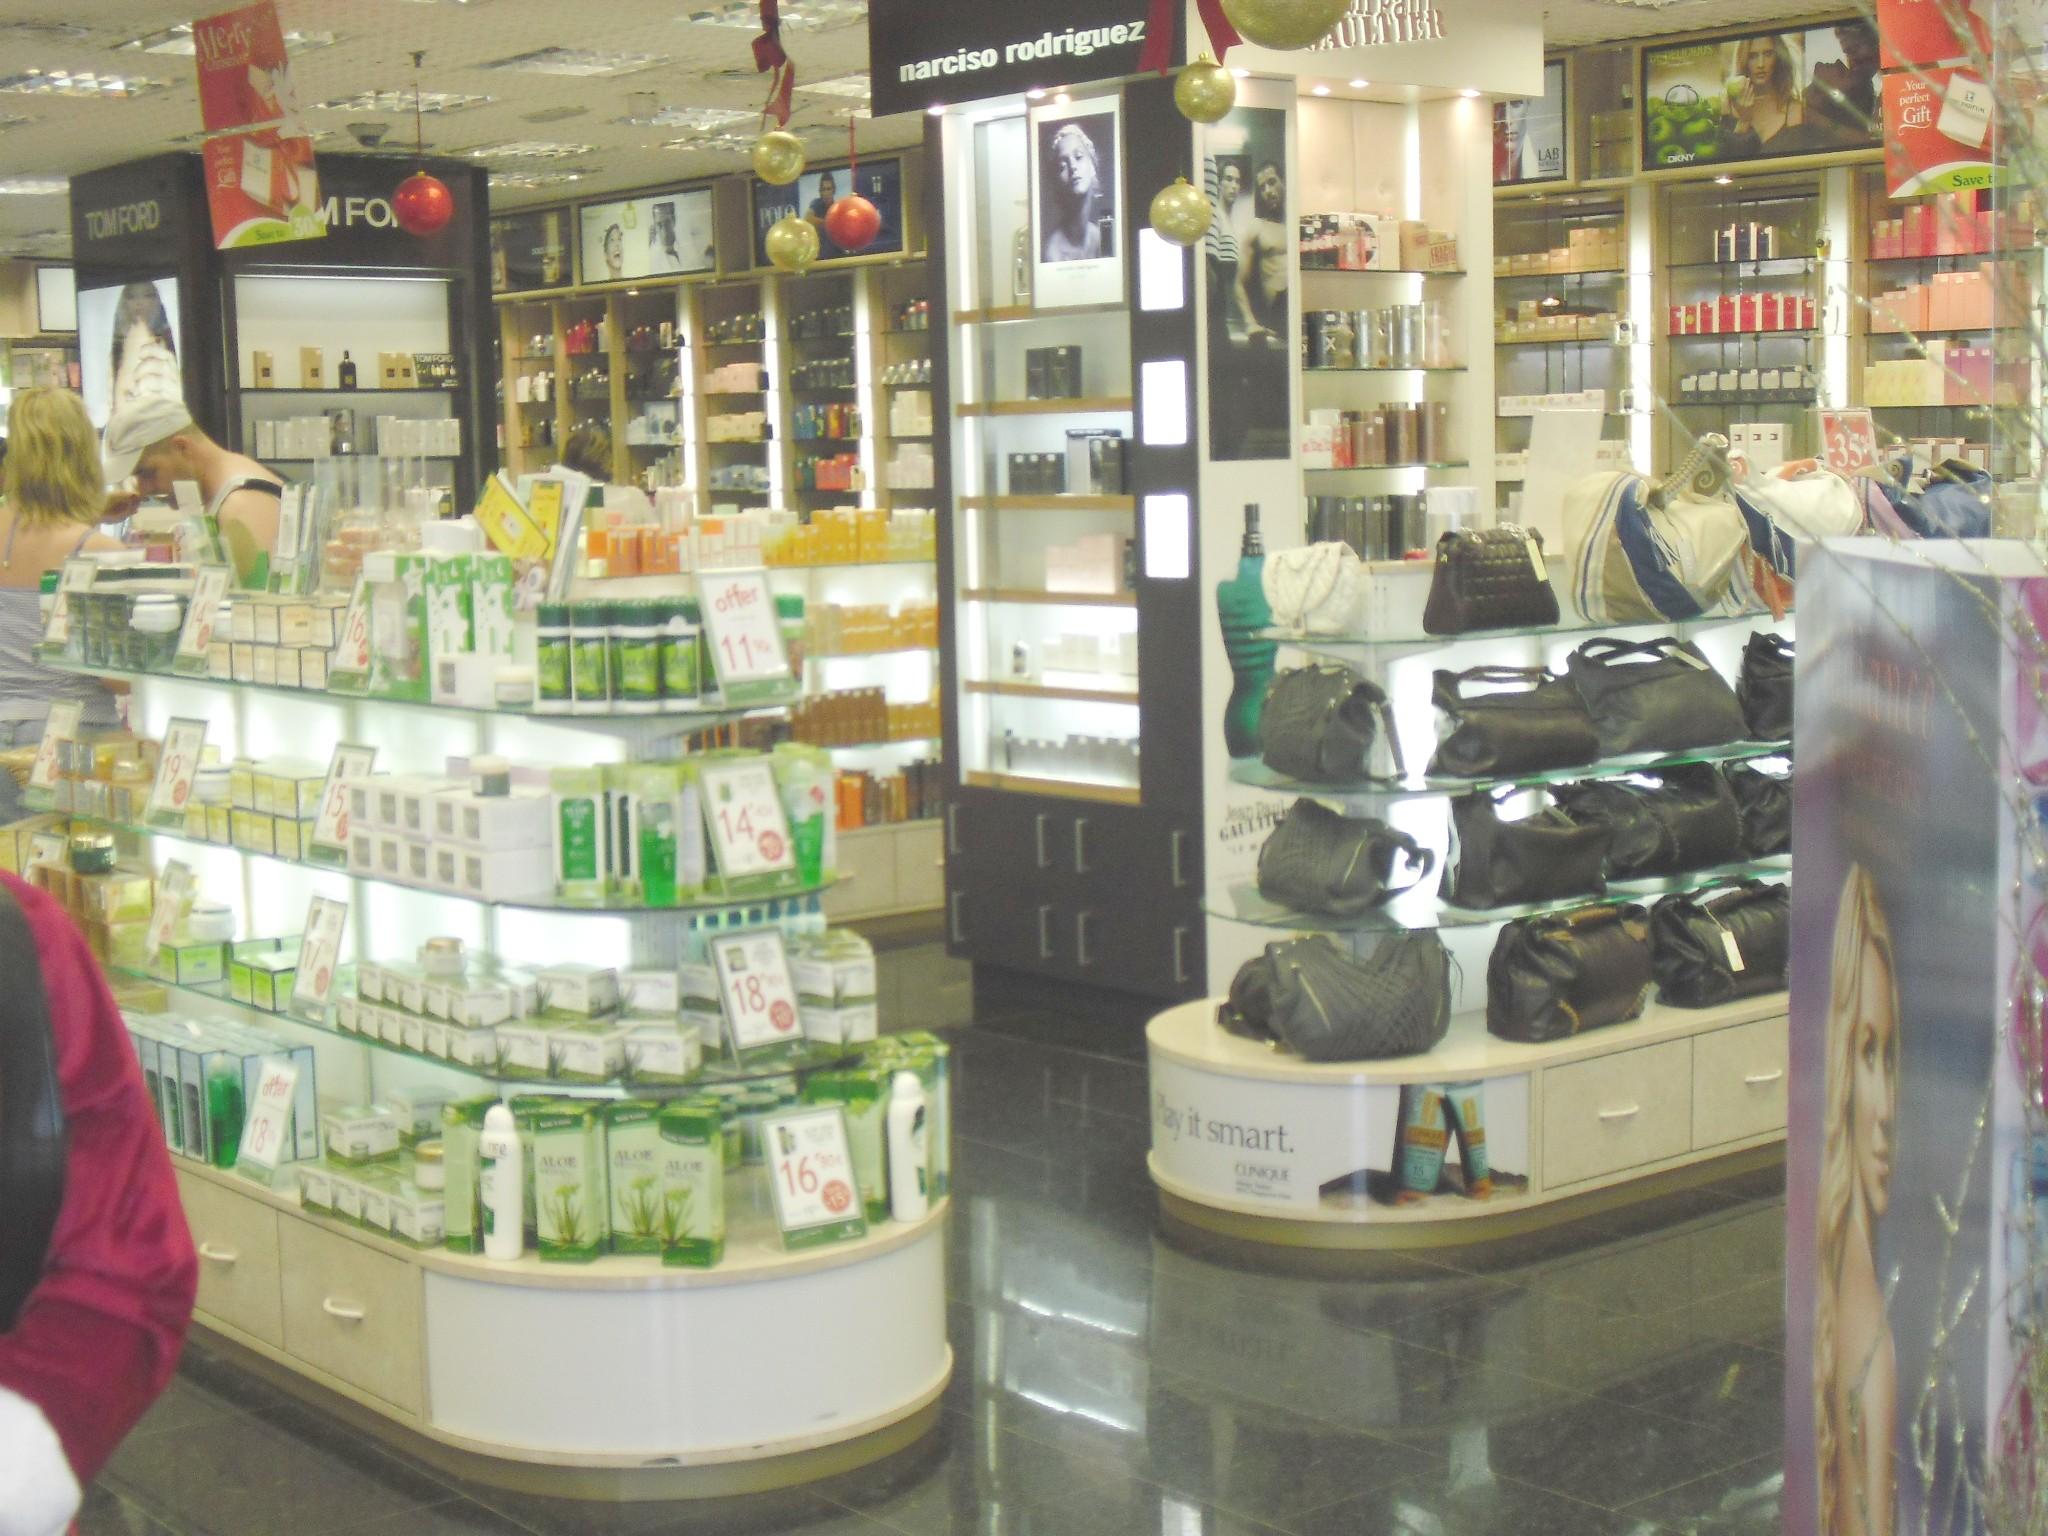 Arredamenti per profumerie compra in fabbrica for Guidi arredamenti san marino